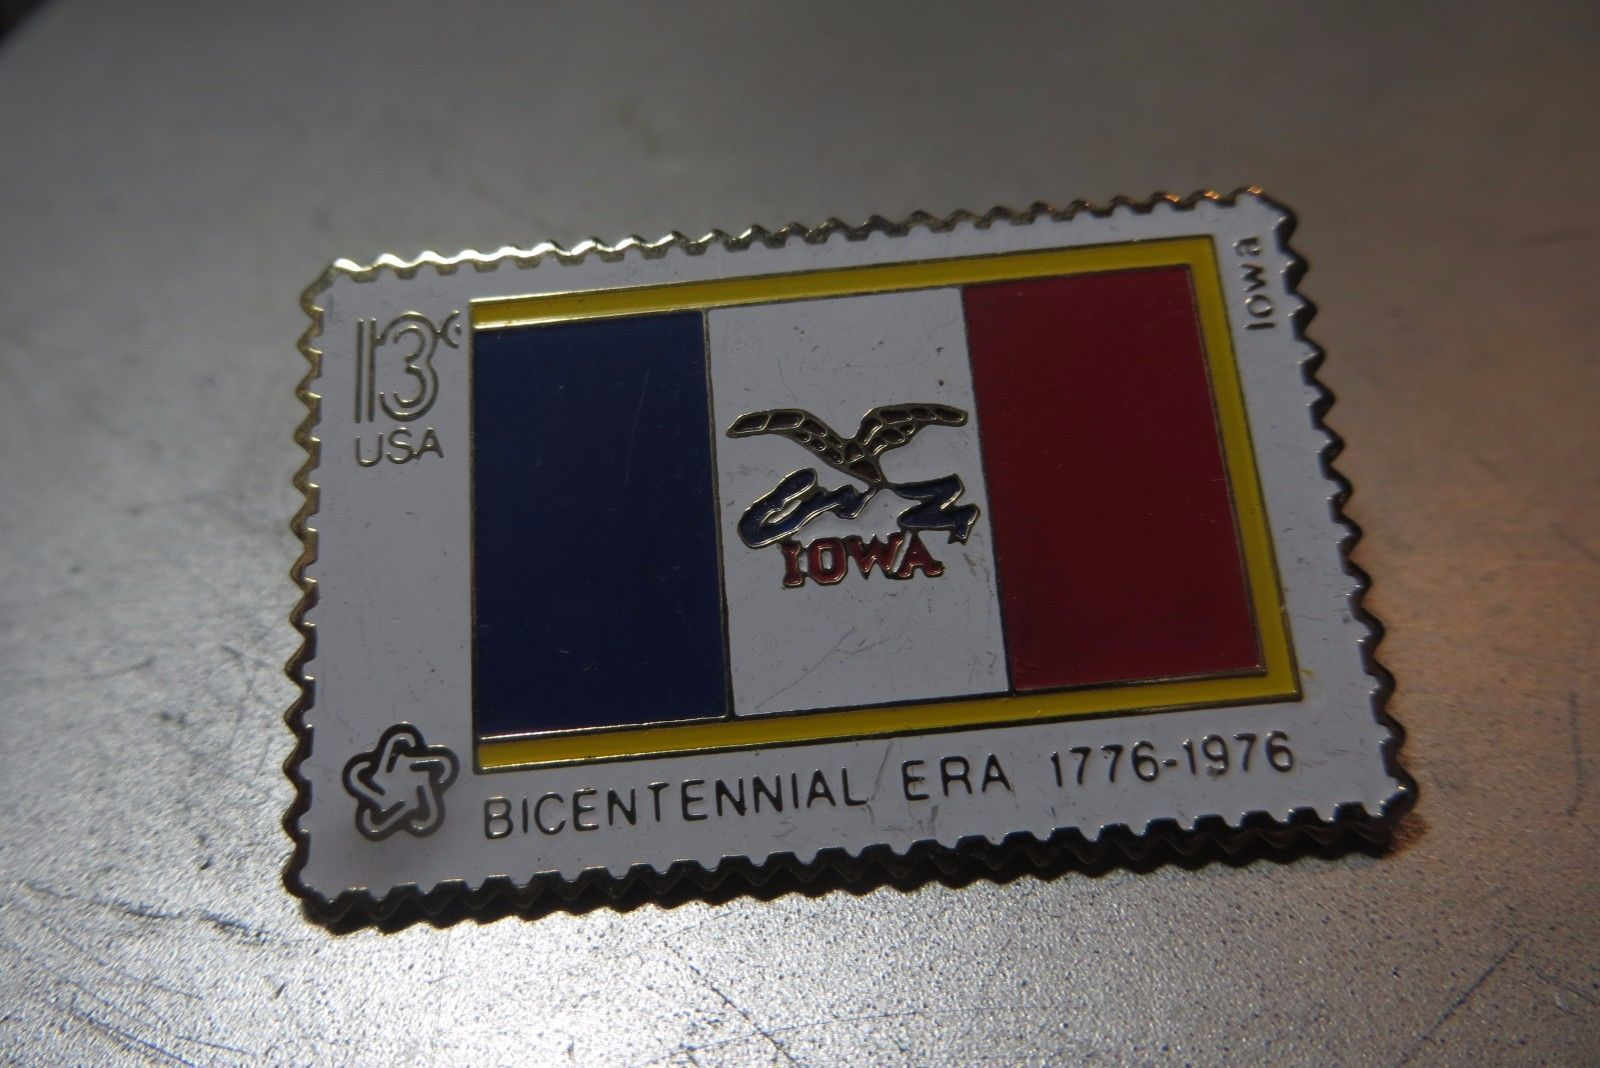 Bicentennial era 1776-1976 State of Iowa 13 cent stamp pin